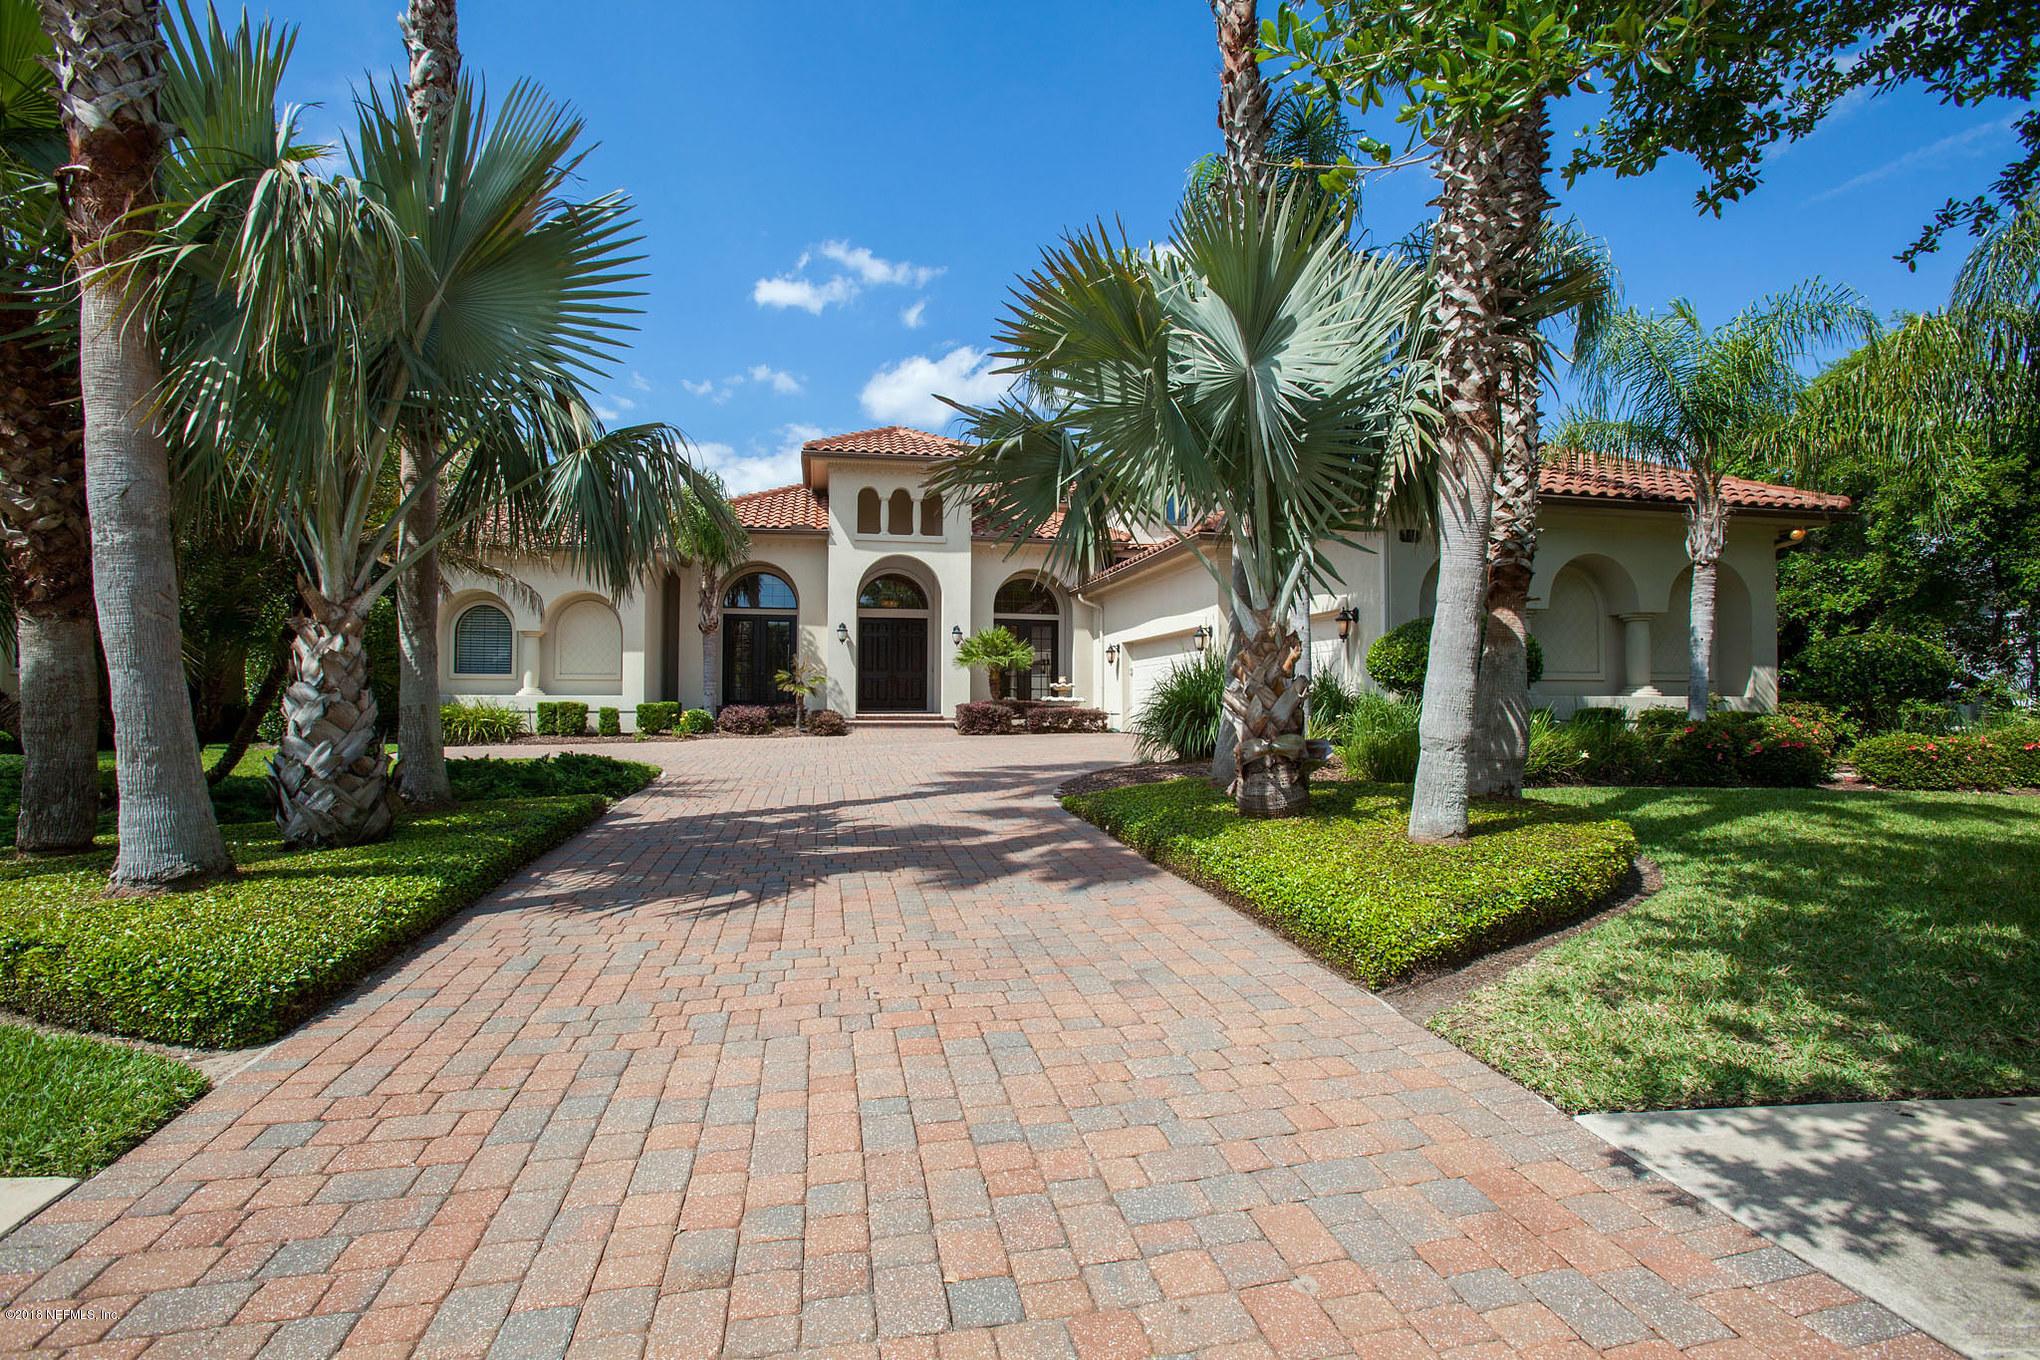 314 SOPHIA, ST AUGUSTINE, FLORIDA 32095, 4 Bedrooms Bedrooms, ,4 BathroomsBathrooms,Residential - single family,For sale,SOPHIA,933721